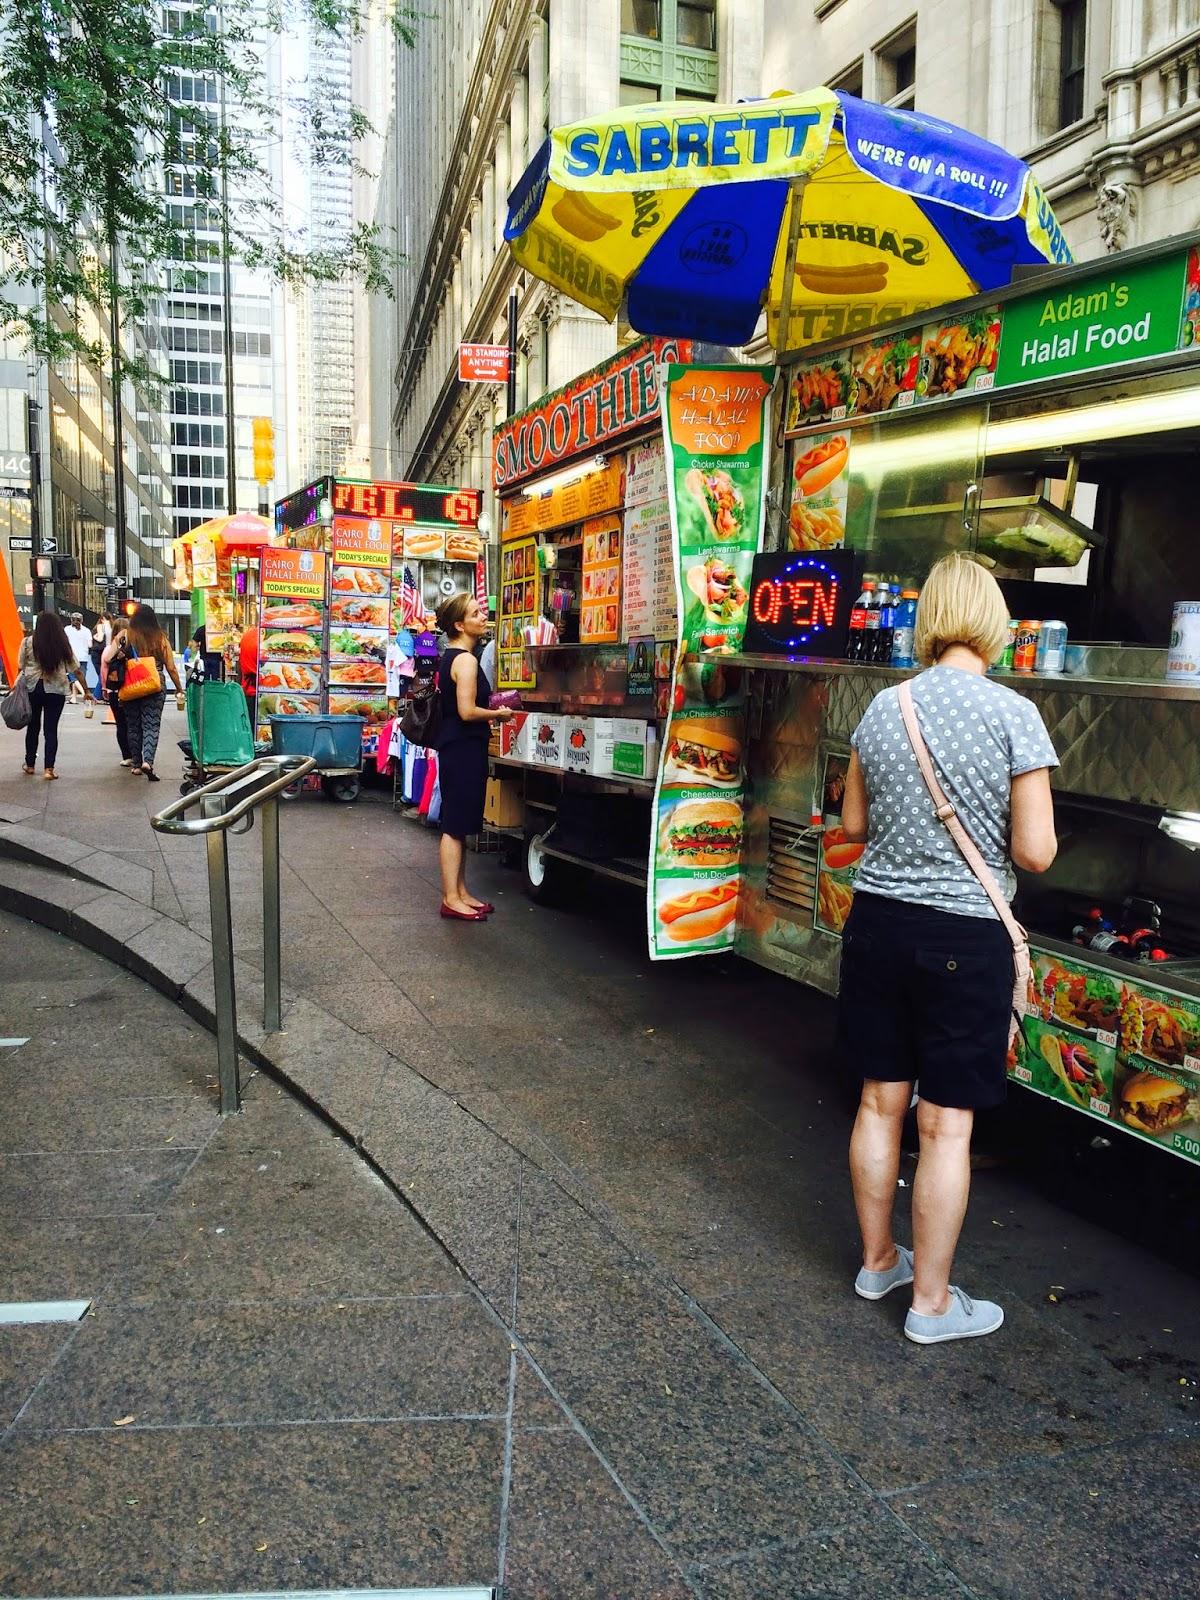 NY FOOD TRUCKS | TURISTAS POCO FRECUENTES